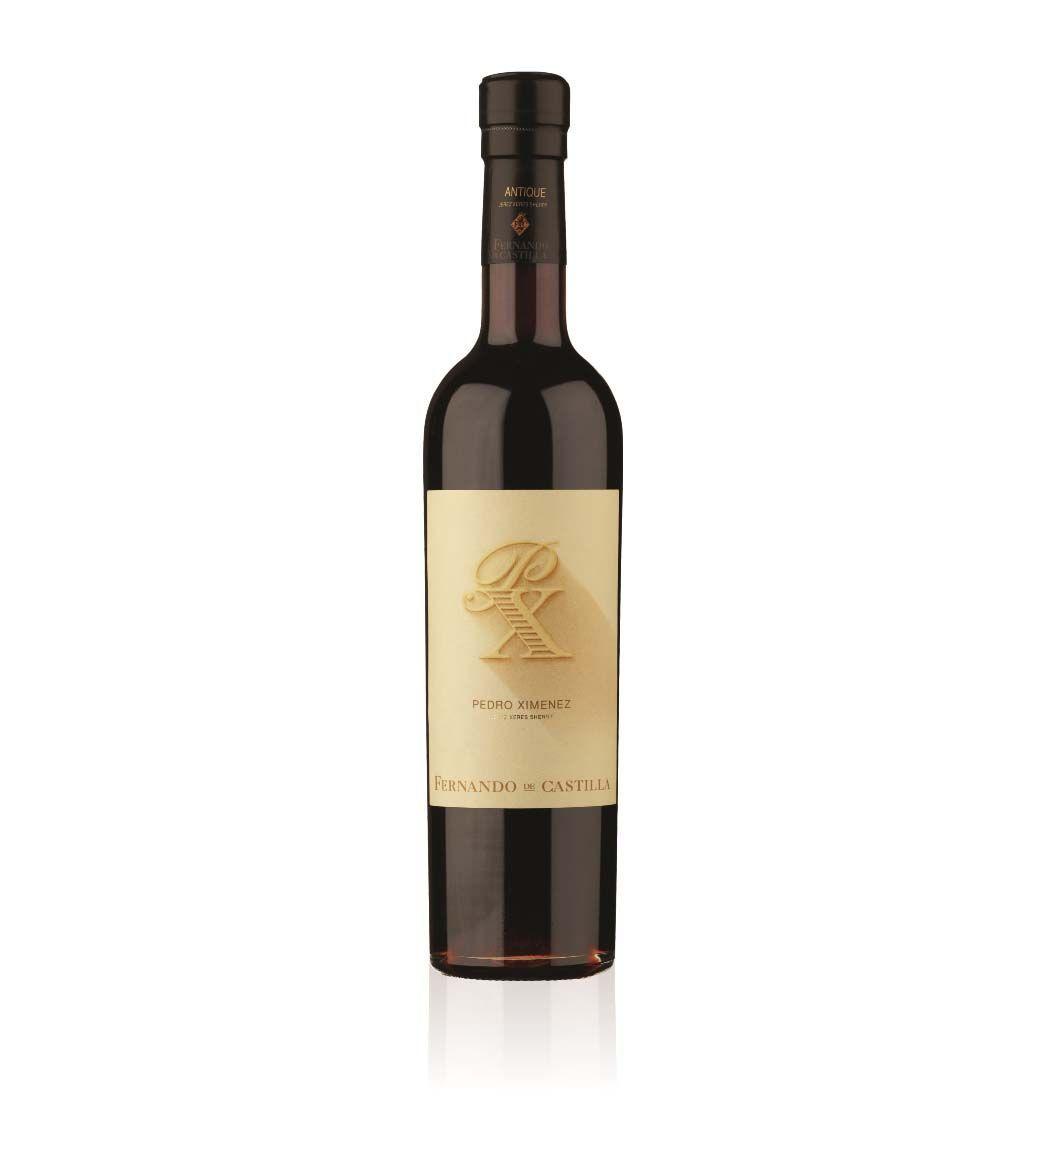 Antique pedro xim nez vino de jerez vinos con d o p - Vino de pedro ximenez para cocinar ...